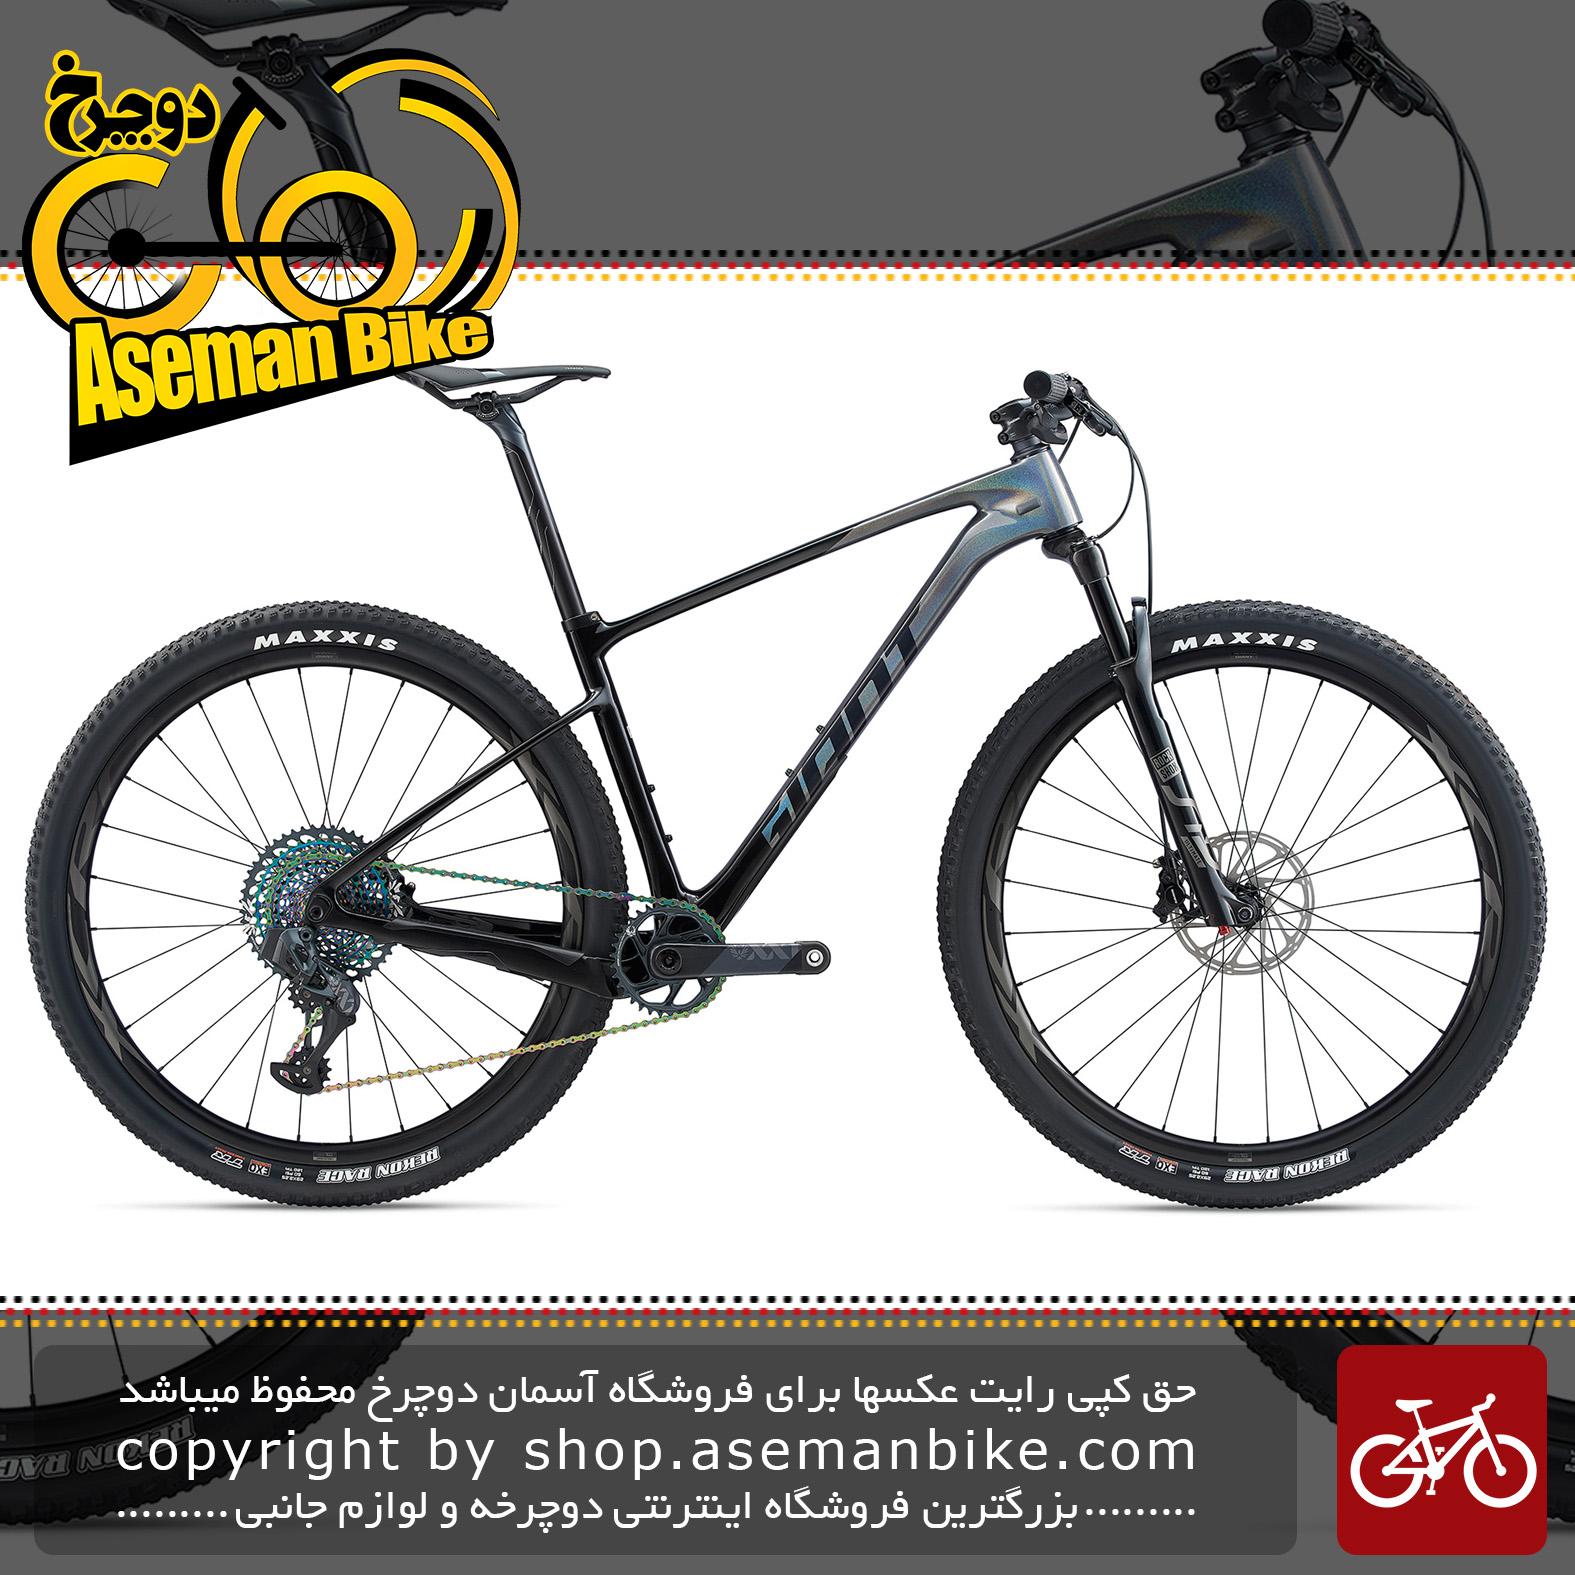 دوچرخه کوهستان جاینت مدل ایکس تی سی ادونس اس ال 29 اینچ 0 2020 Giant Mountain Bicycle XTC Advanced SL 29 0 2020